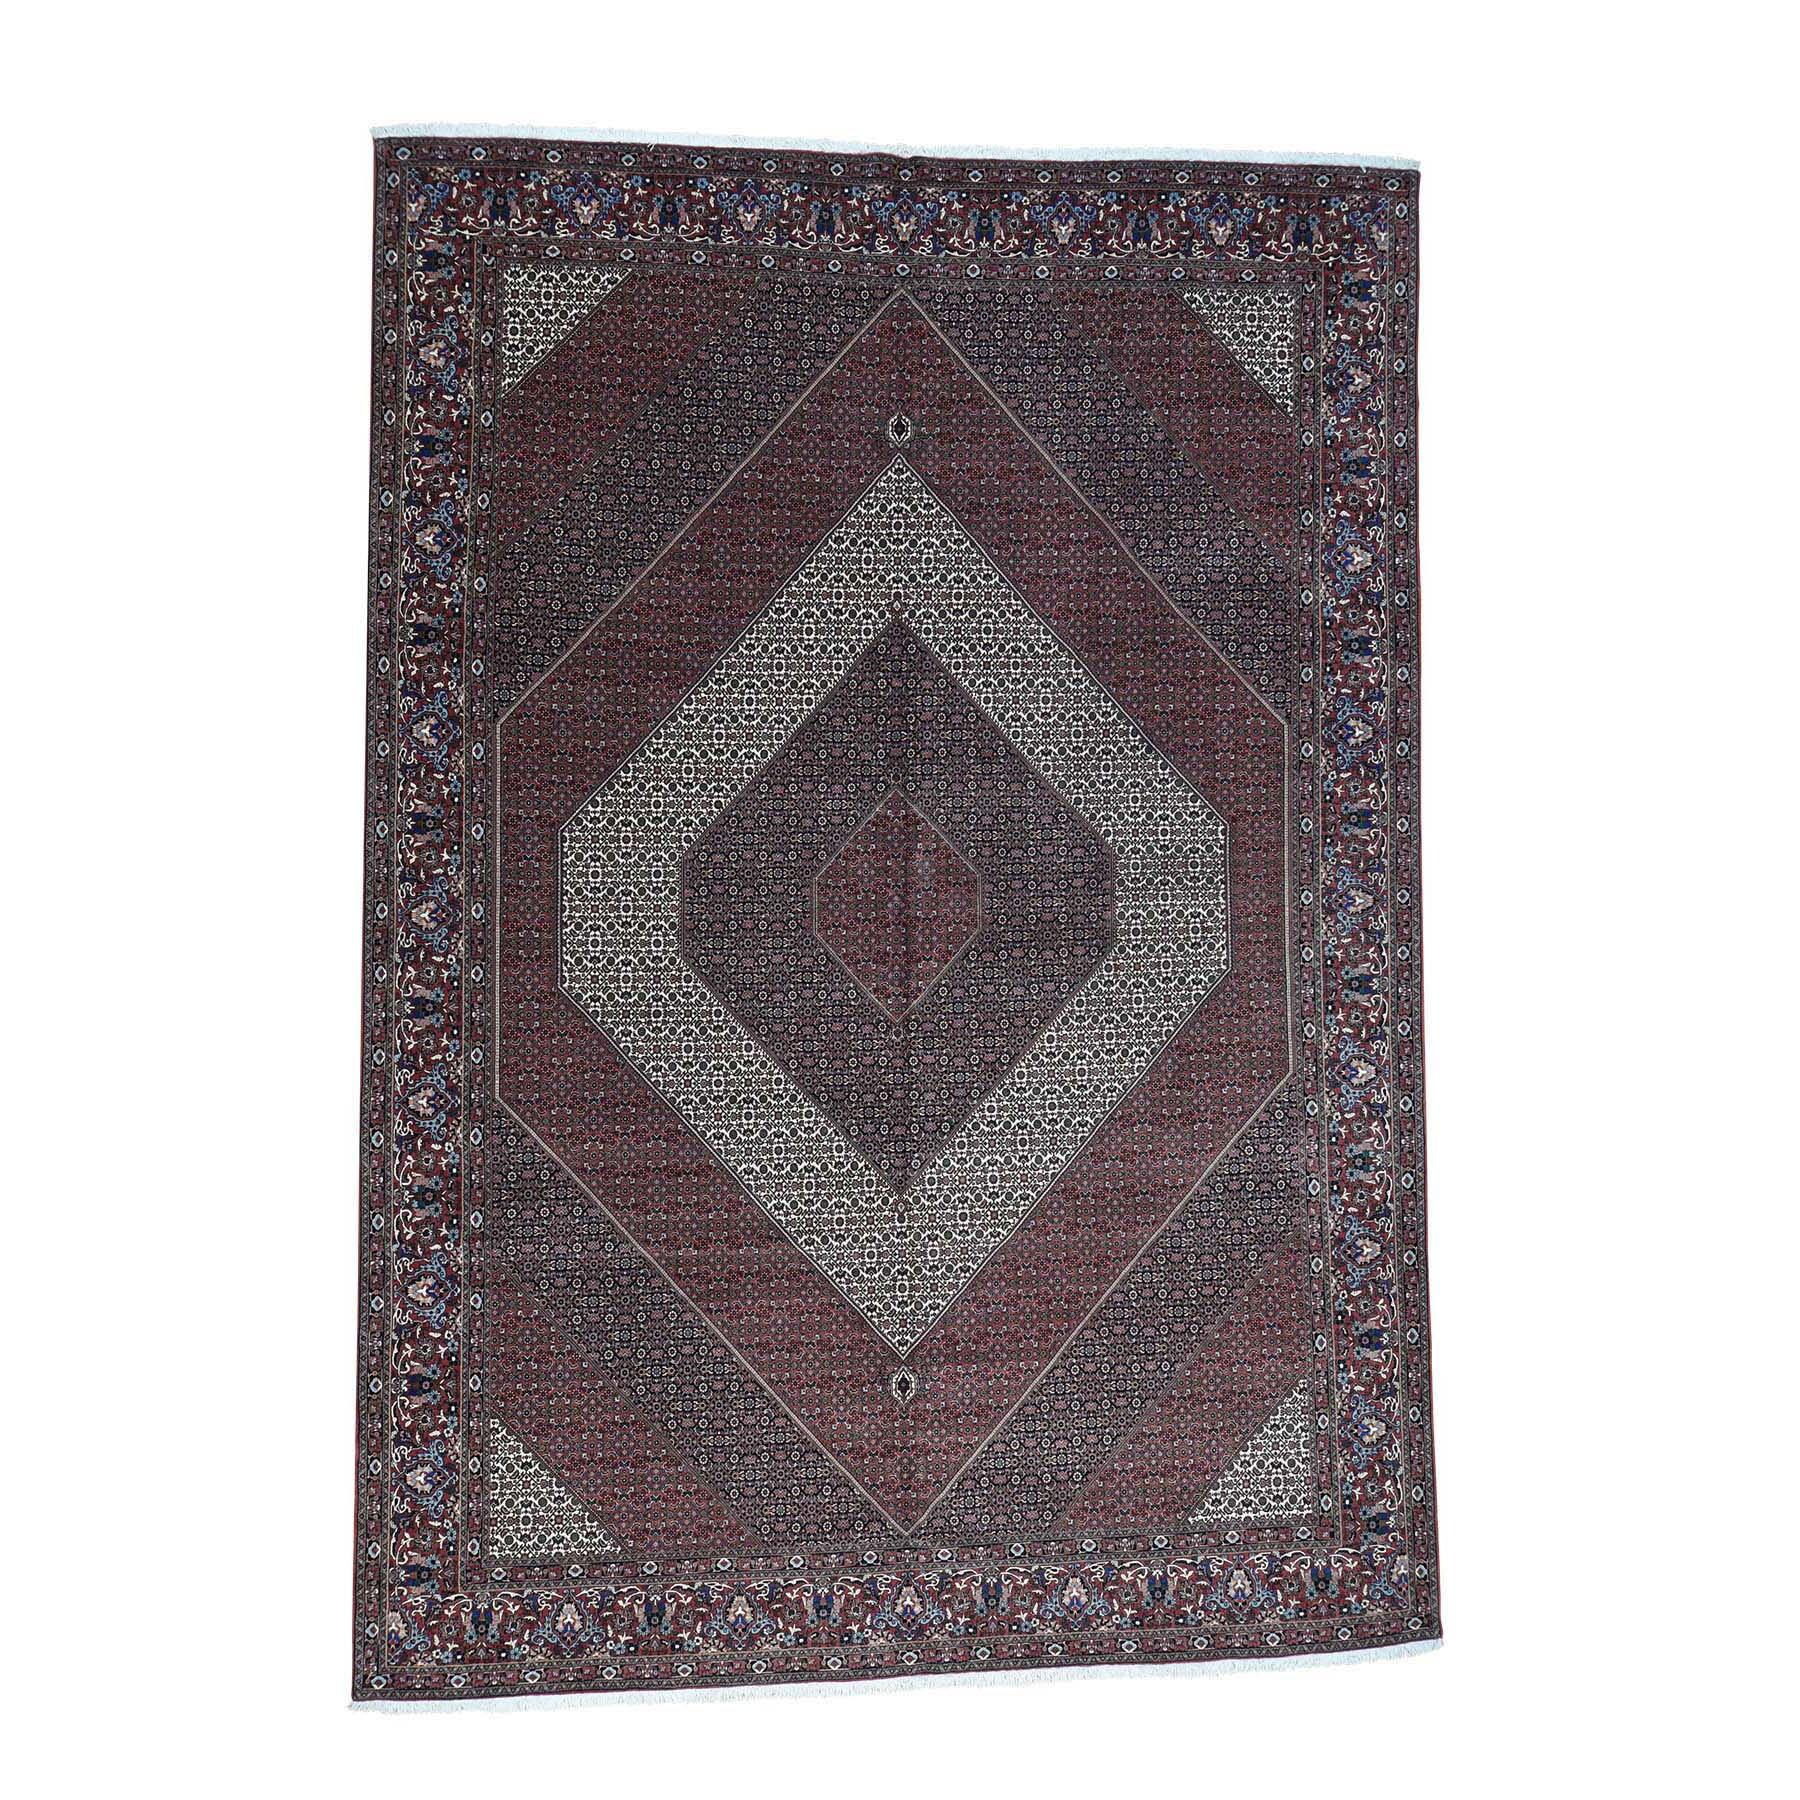 Shahbanu Rugs Handmade Oversize Persian Bidjar 400 Kpsi Wool And Silk Rug